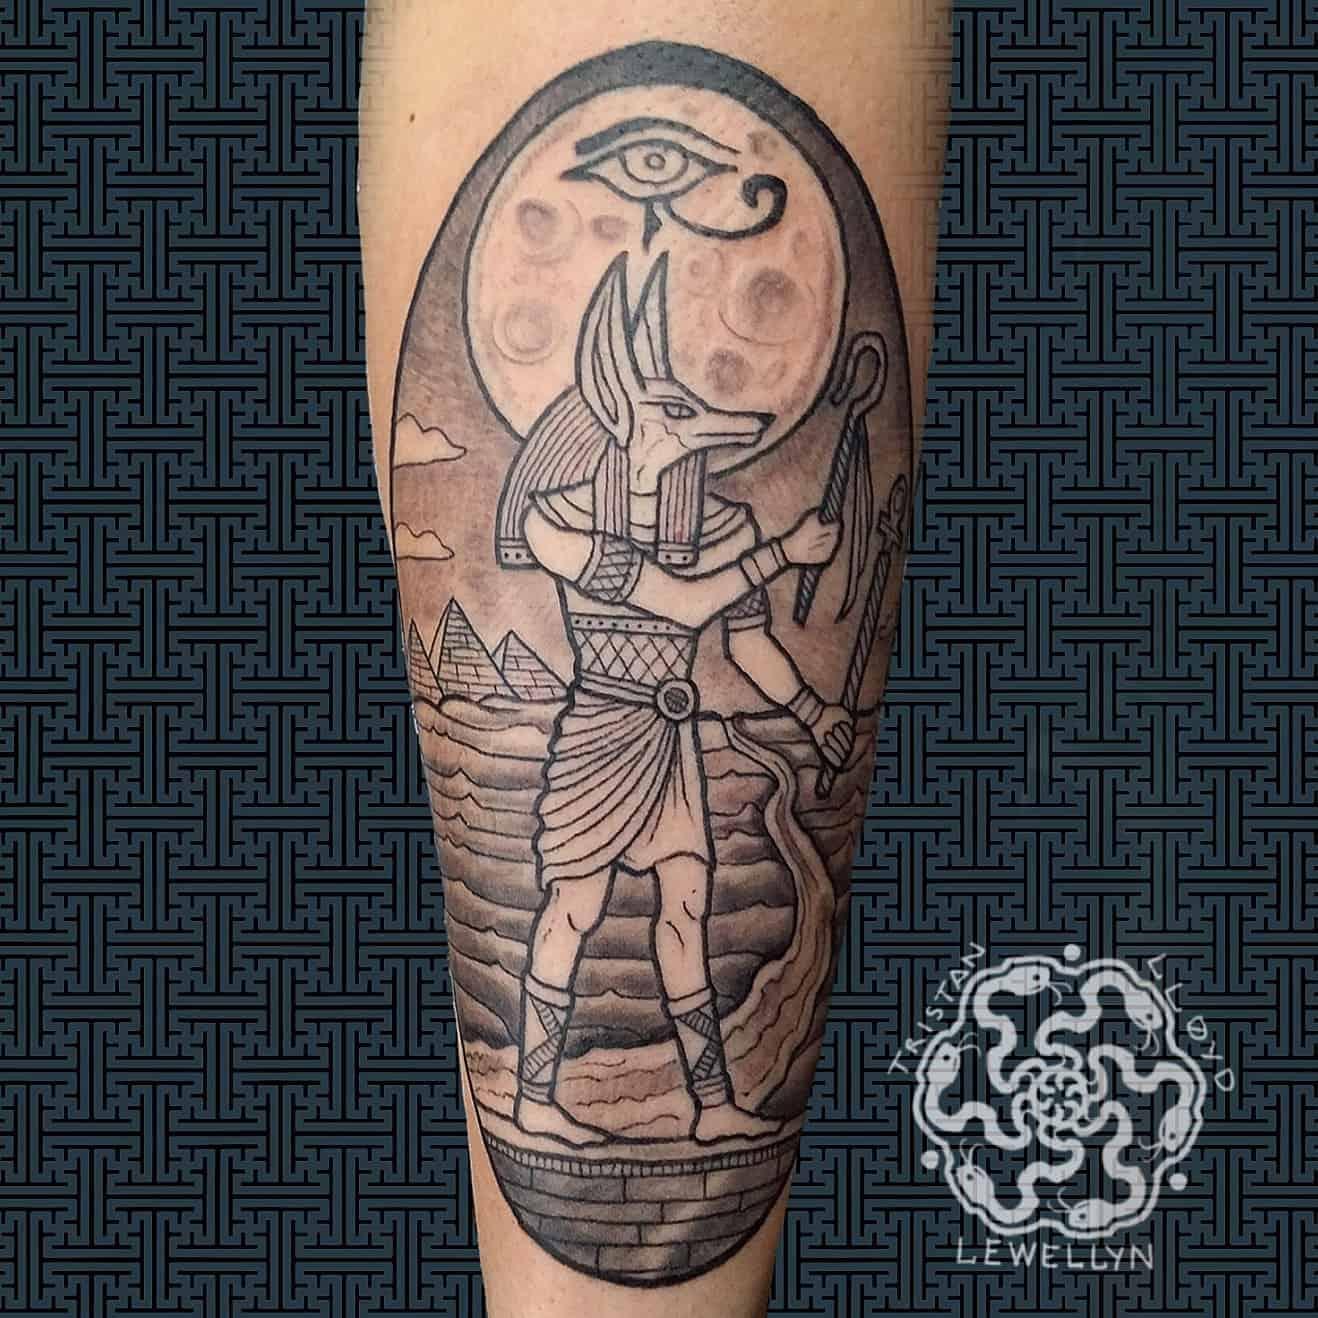 blackwork tattoo of egyptian annubis on a forearm